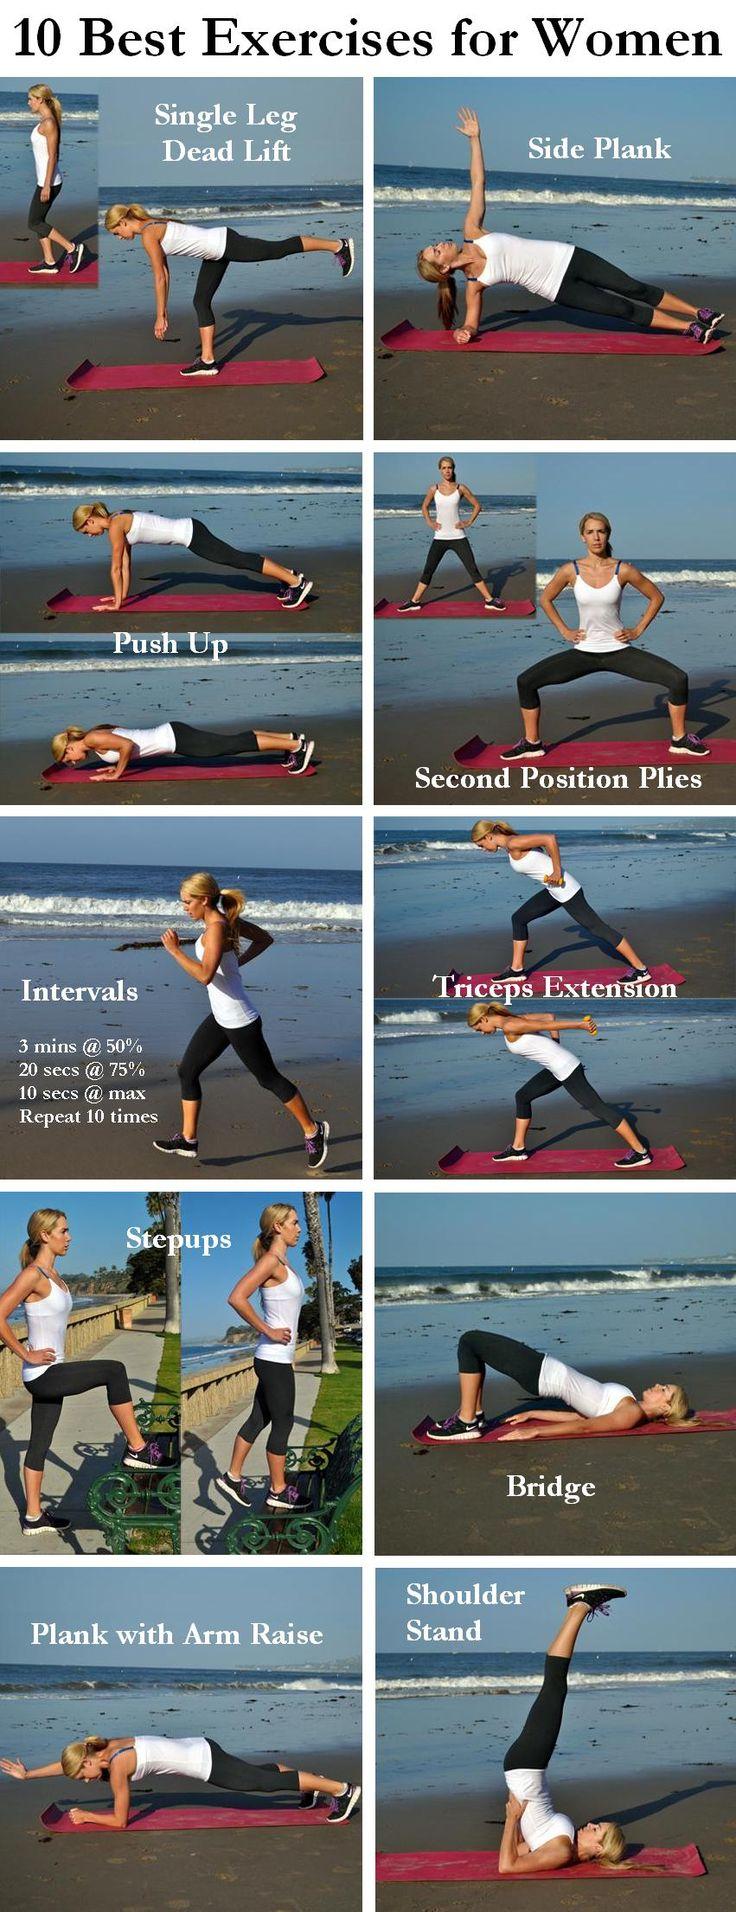 10 Best Exercises for Women http://www.shape.com/fitness/workouts/10-best-exercises-women